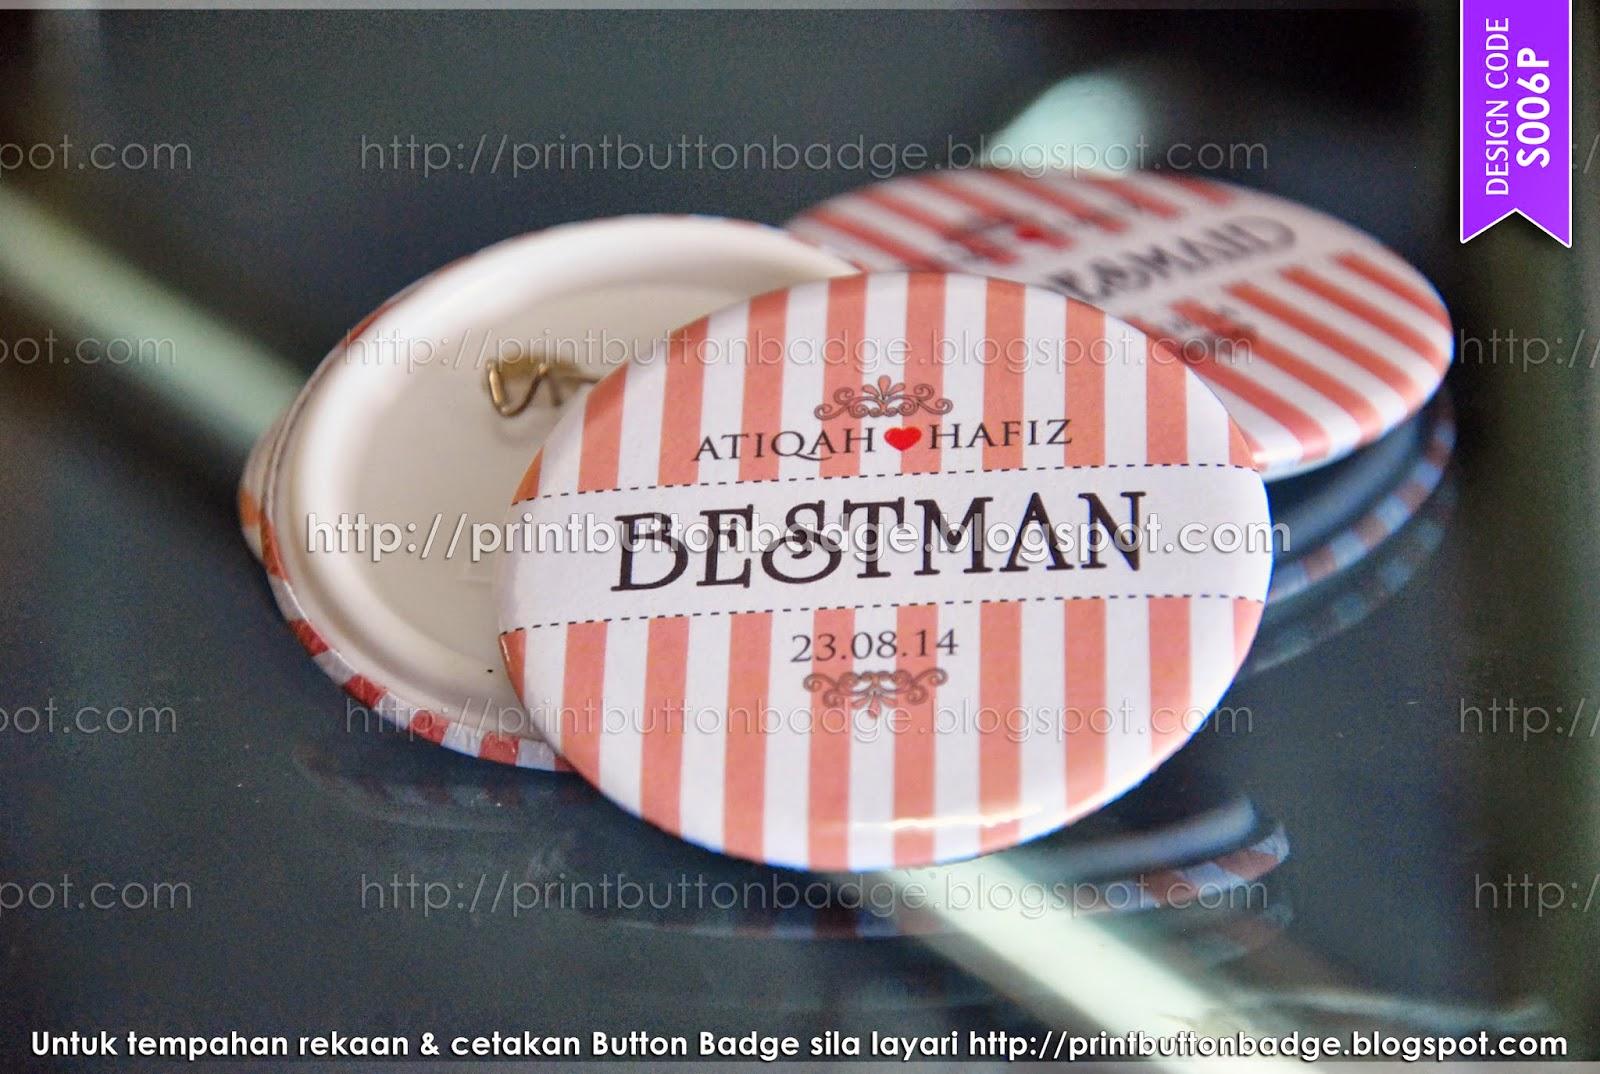 cetakan button badge